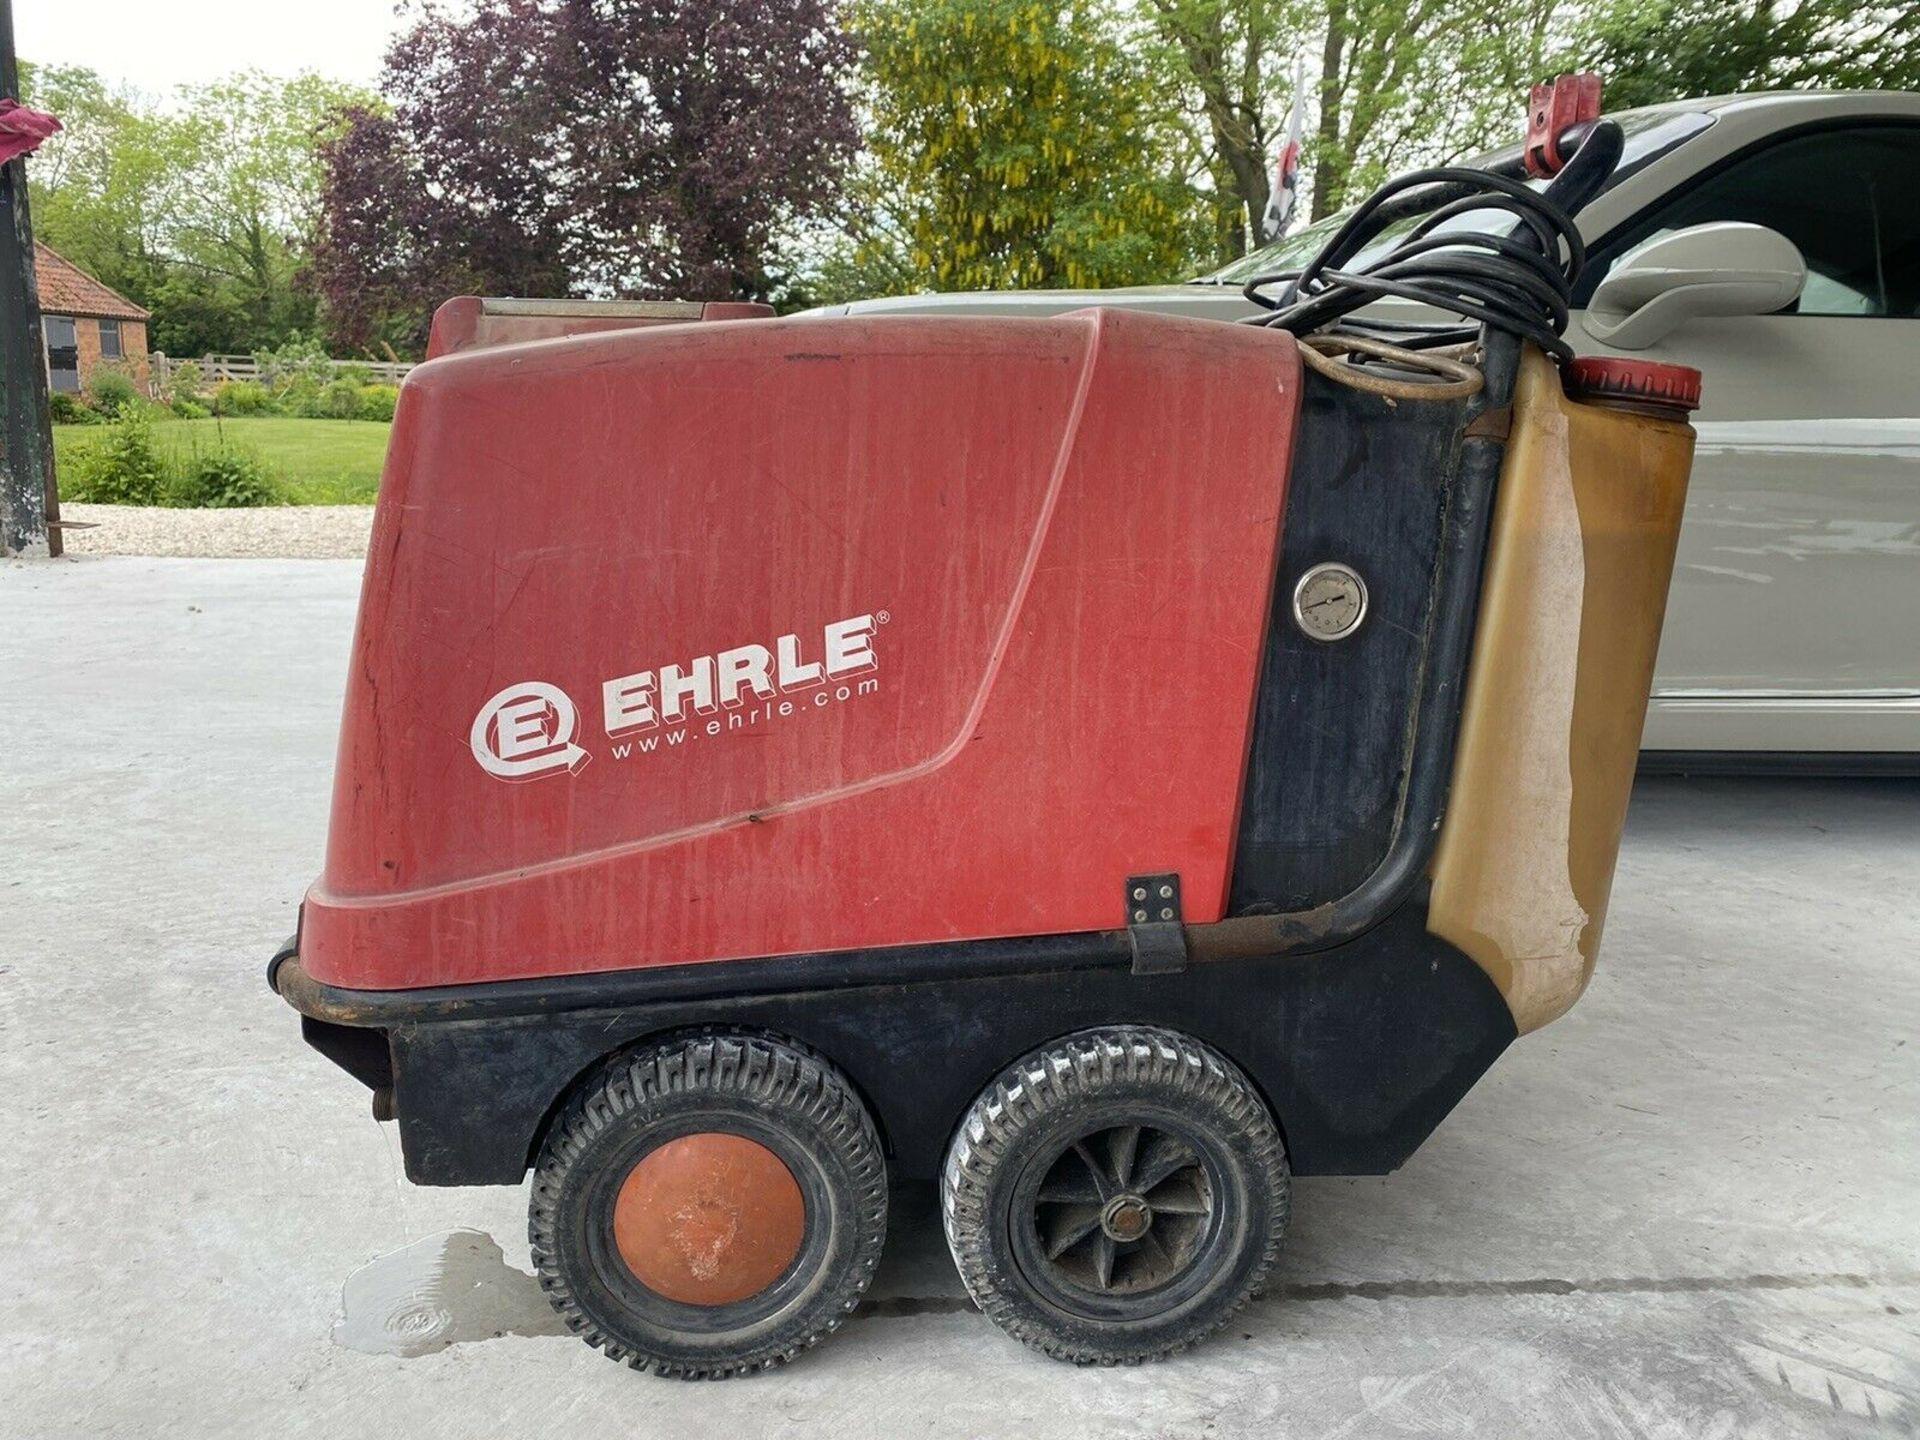 EHRLE HD623 STANDARD HOT WATER PRESSURE WASHER *NO VAT*